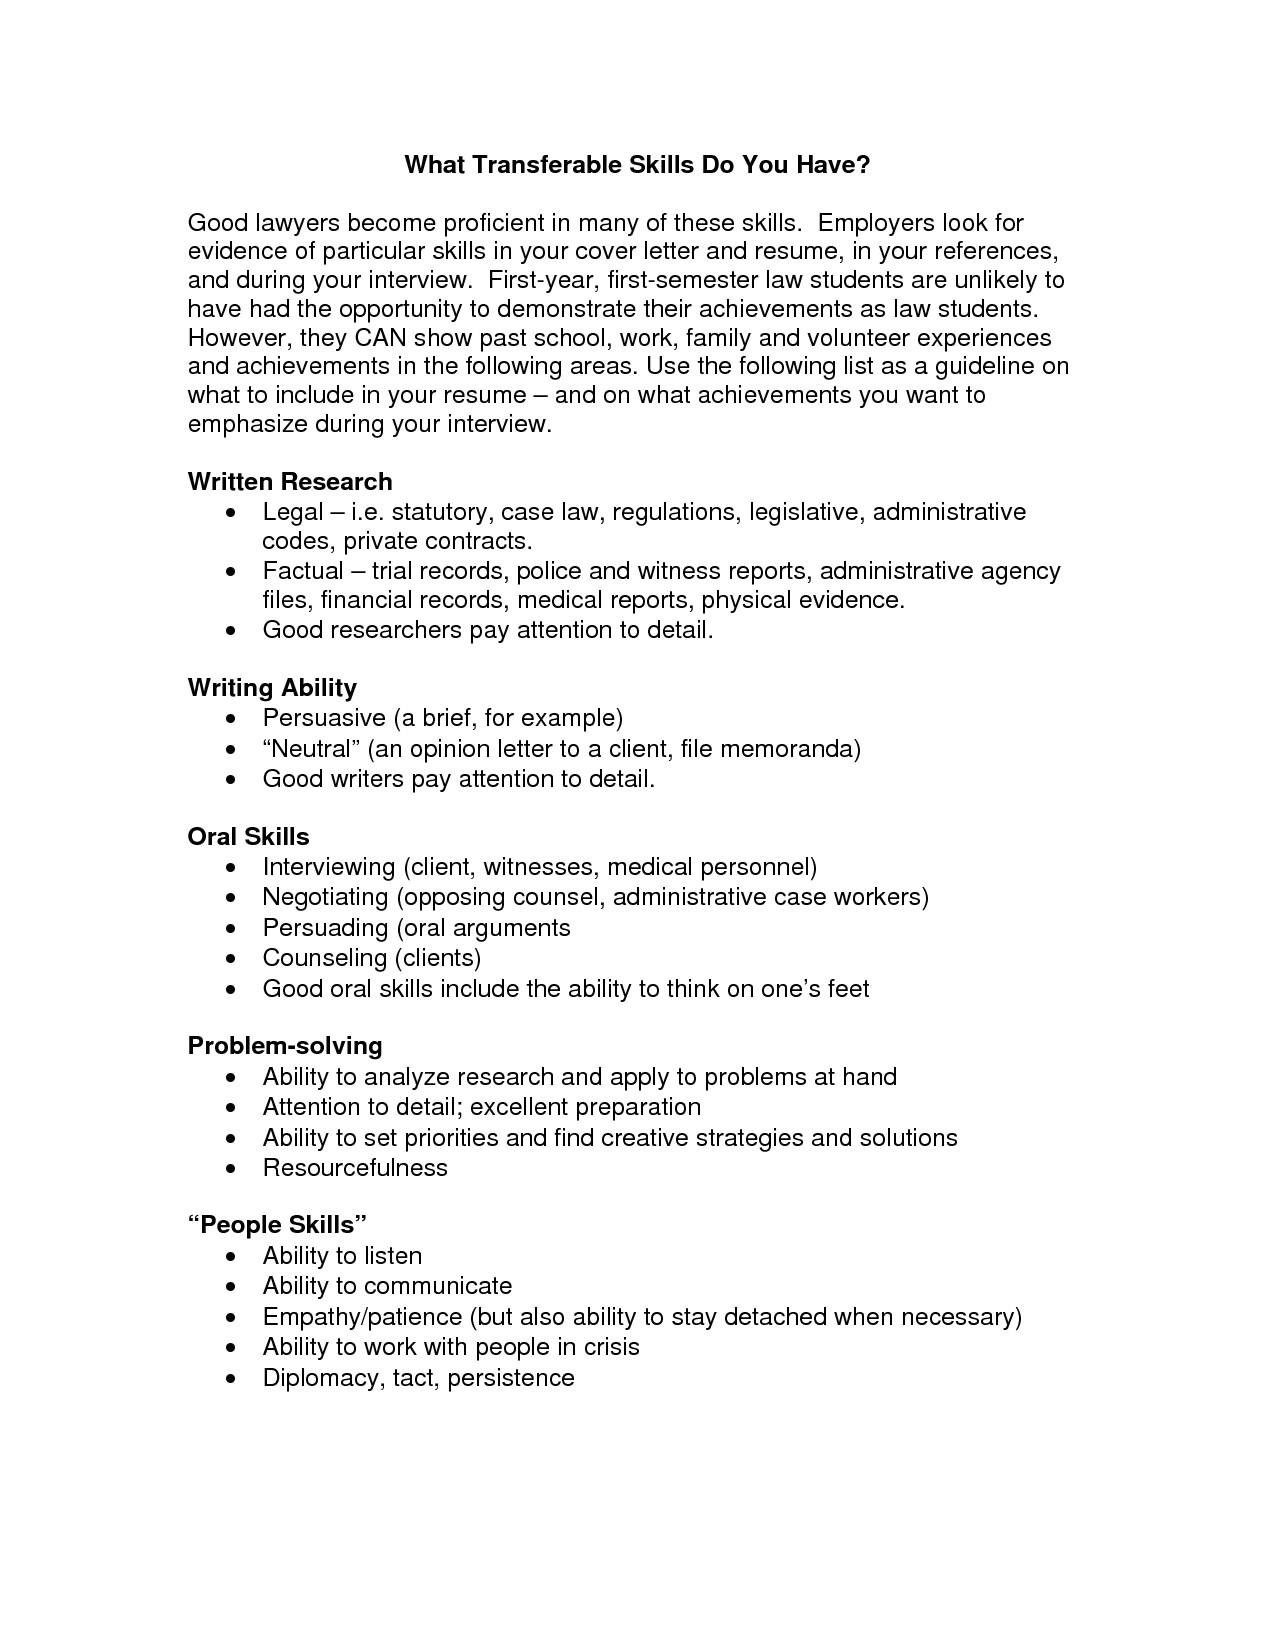 post cover letter for transferable skills 459271